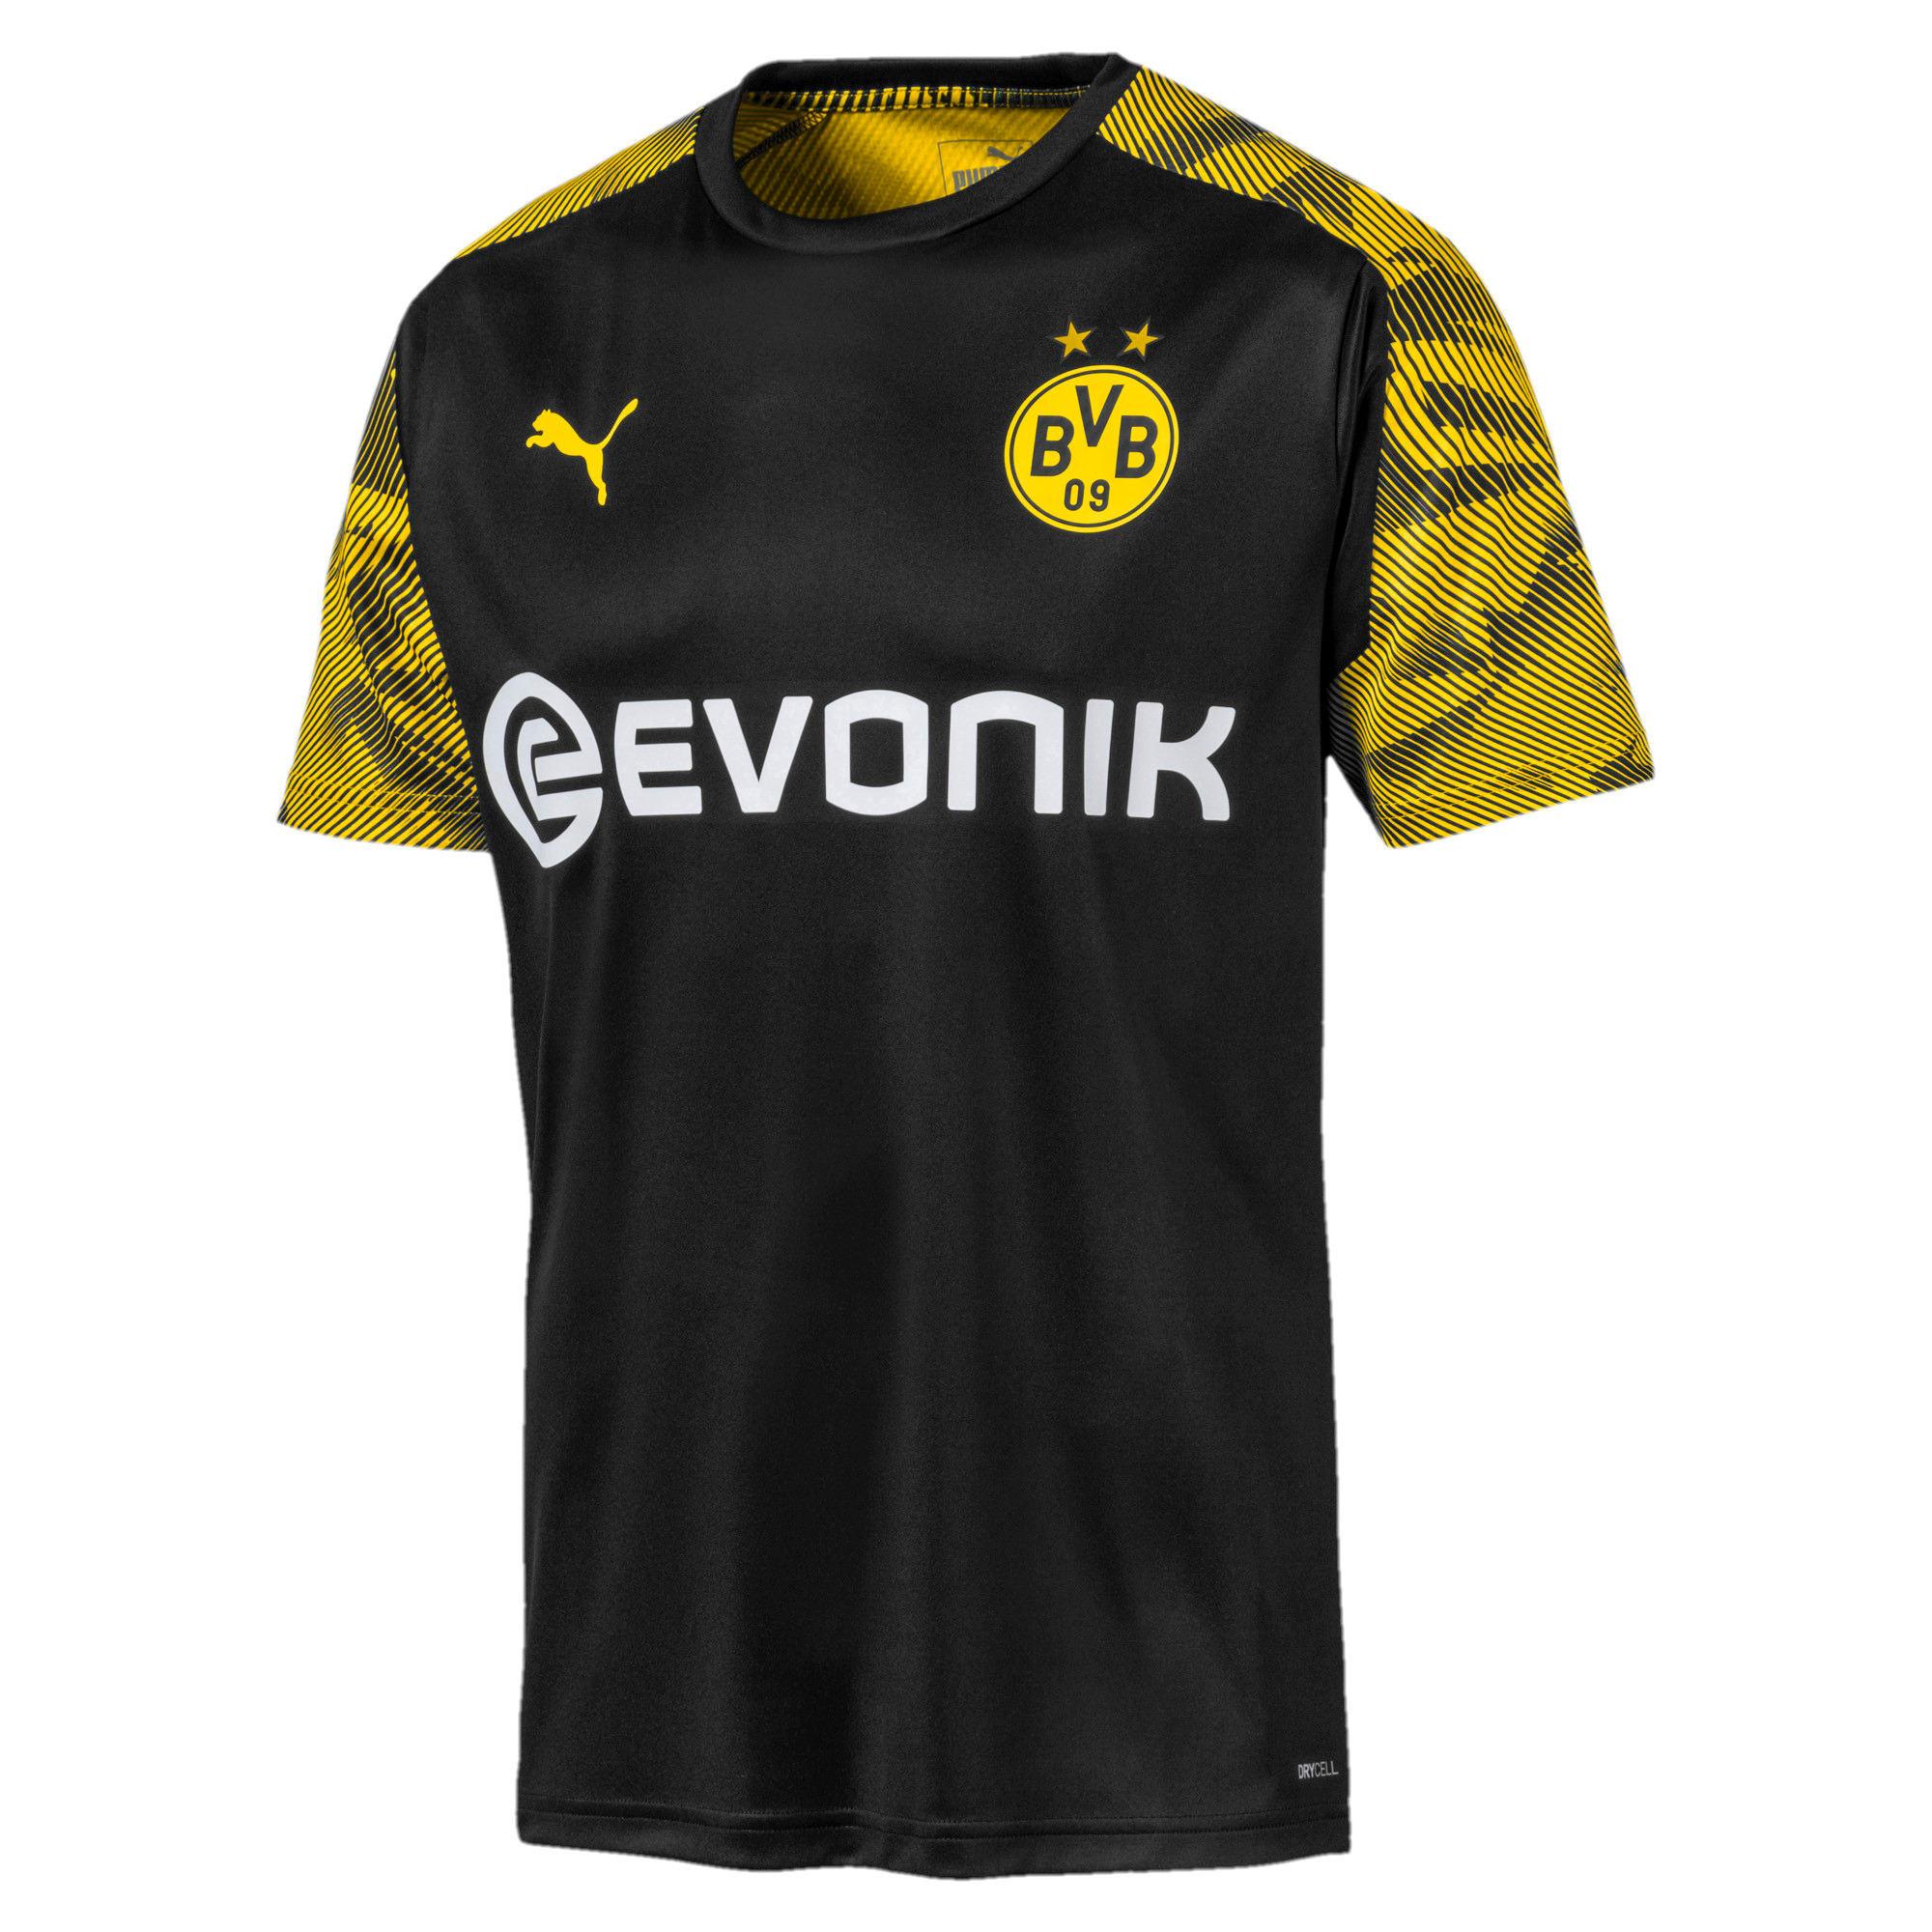 Thumbnail 4 of BVB Men's Training Jersey, Puma Black-Cyber Yellow, medium